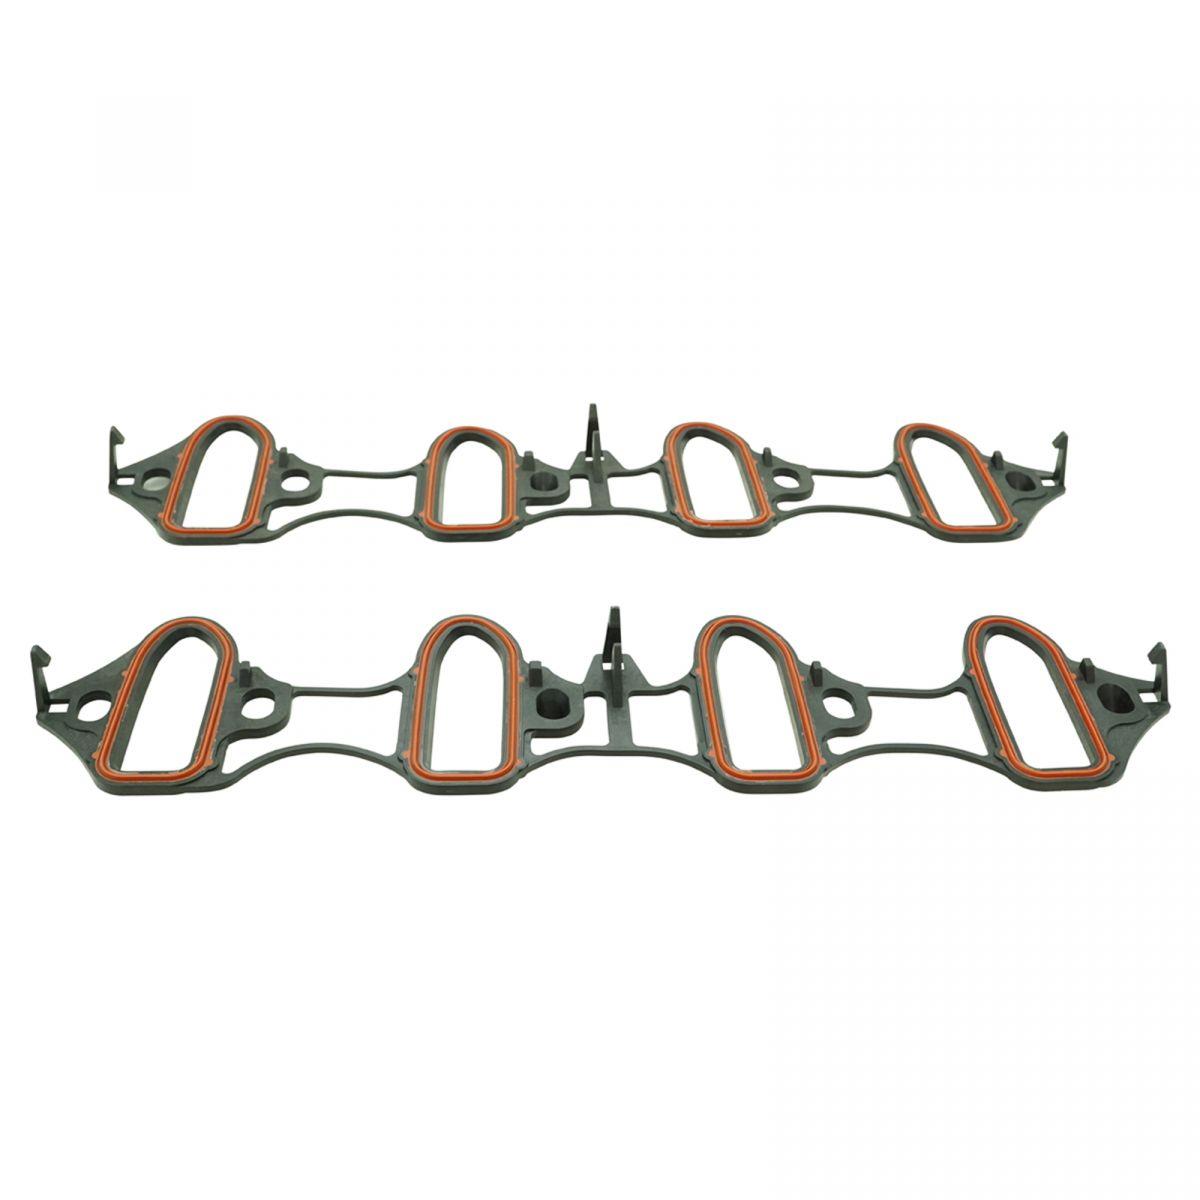 Prime Choice Auto Parts IG106589 Intake Manifold Gasket Set